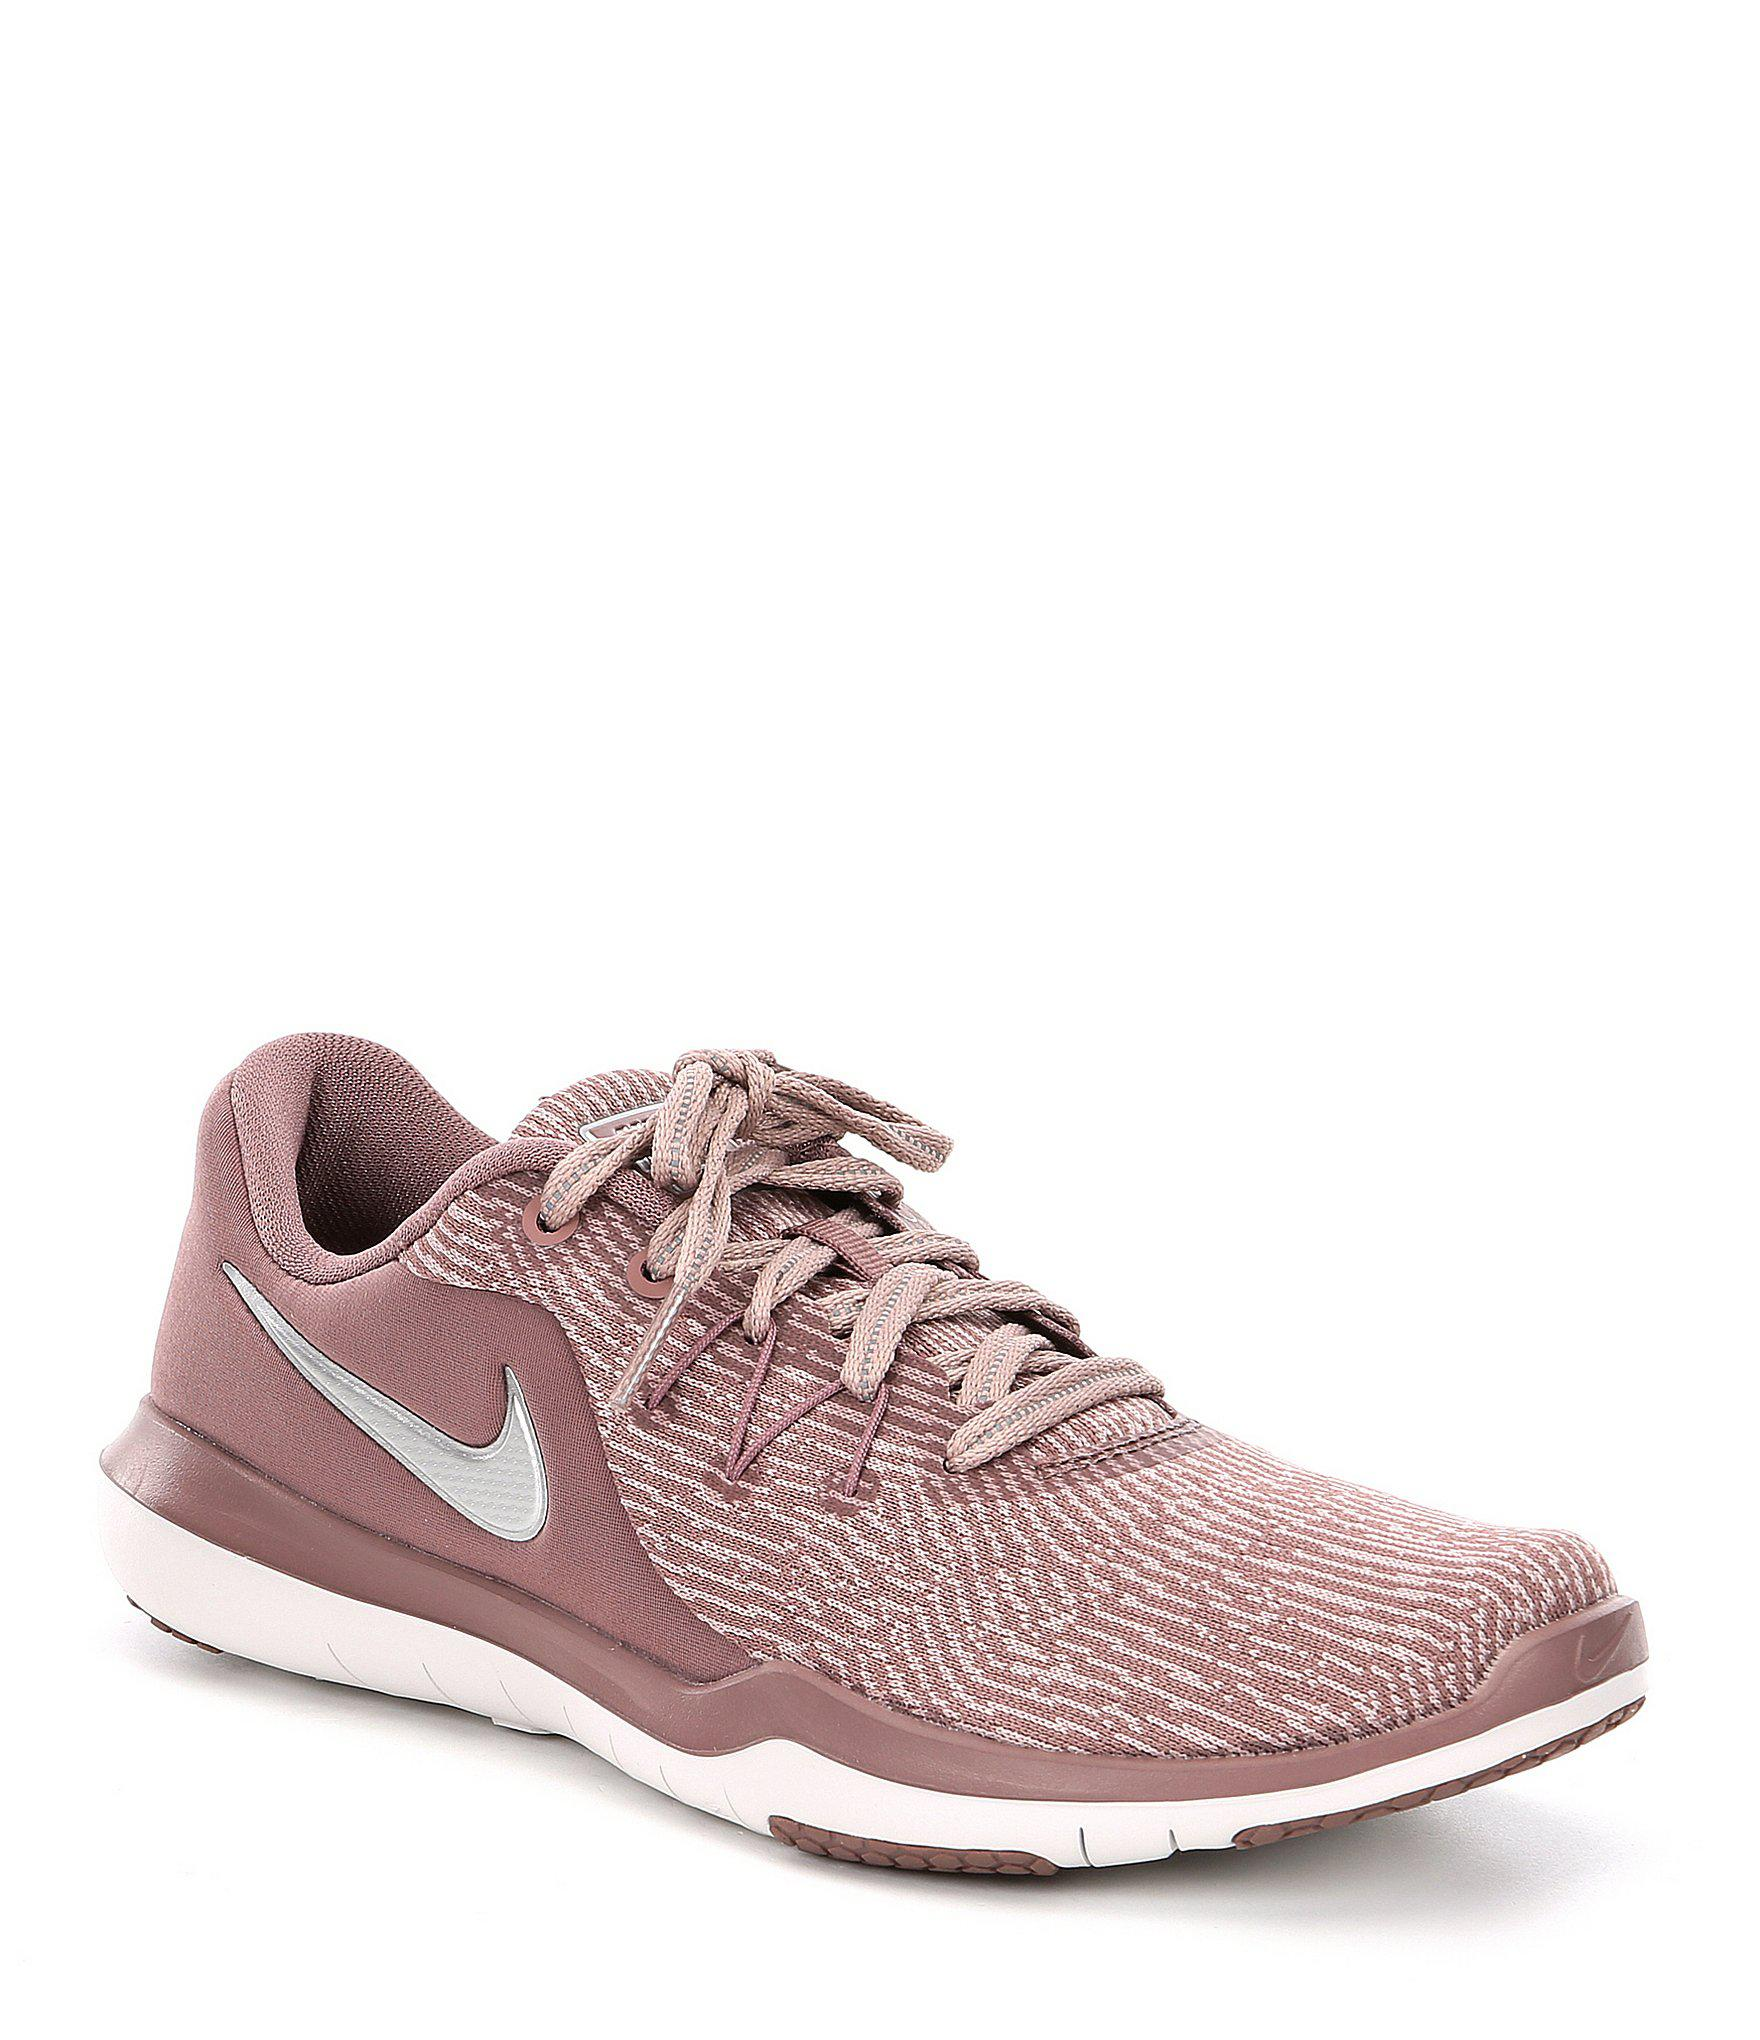 5f899e350e8d5 Lyst - Nike Women s Flex Supreme Tr 6 Print Training Shoe